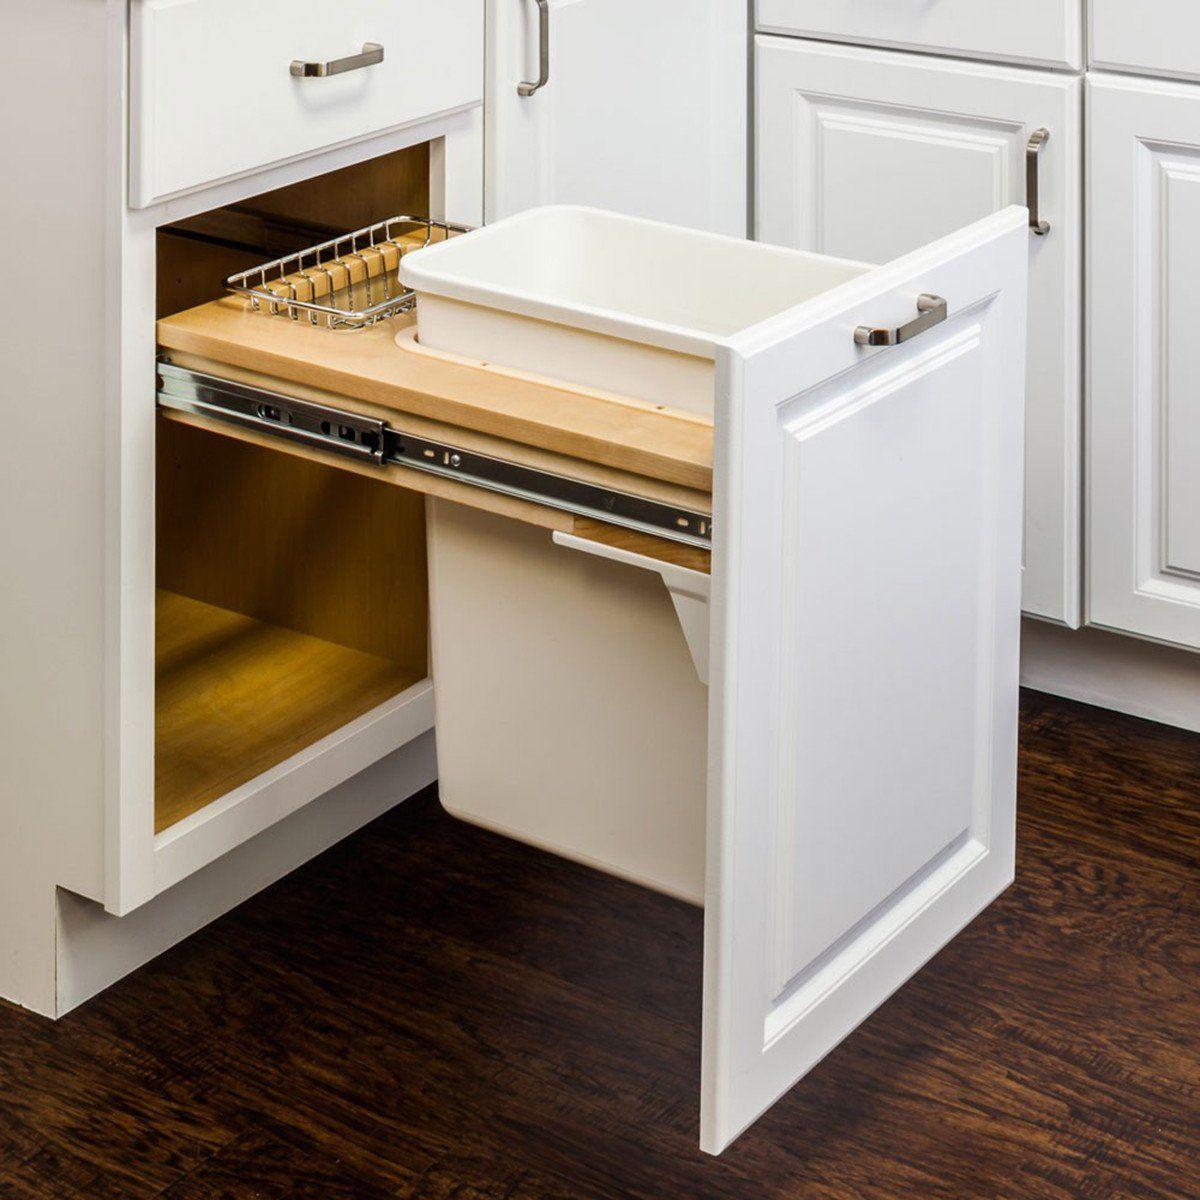 Top Mount Soft Close Single Trash Can Unit Kitchen Remodel Small Kitchen Storage Kitchen Remodel